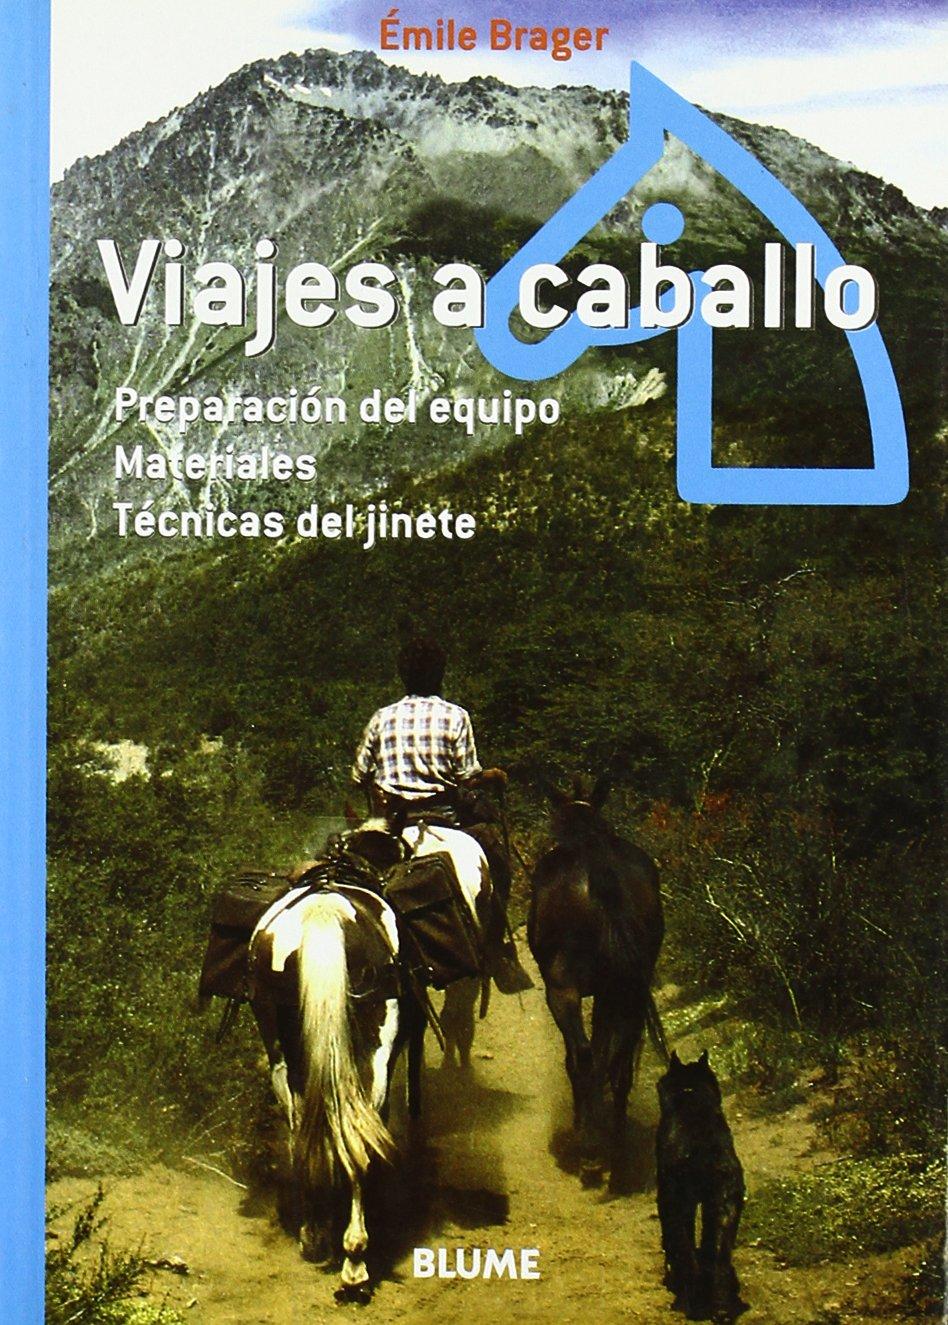 Viajes a caballo: Preparación del equipo. Materiales. Técnicas del jinete Tapa blanda – 16 feb 2005 Émile Brager BLUME (Naturart) 8480764341 Horse Racing